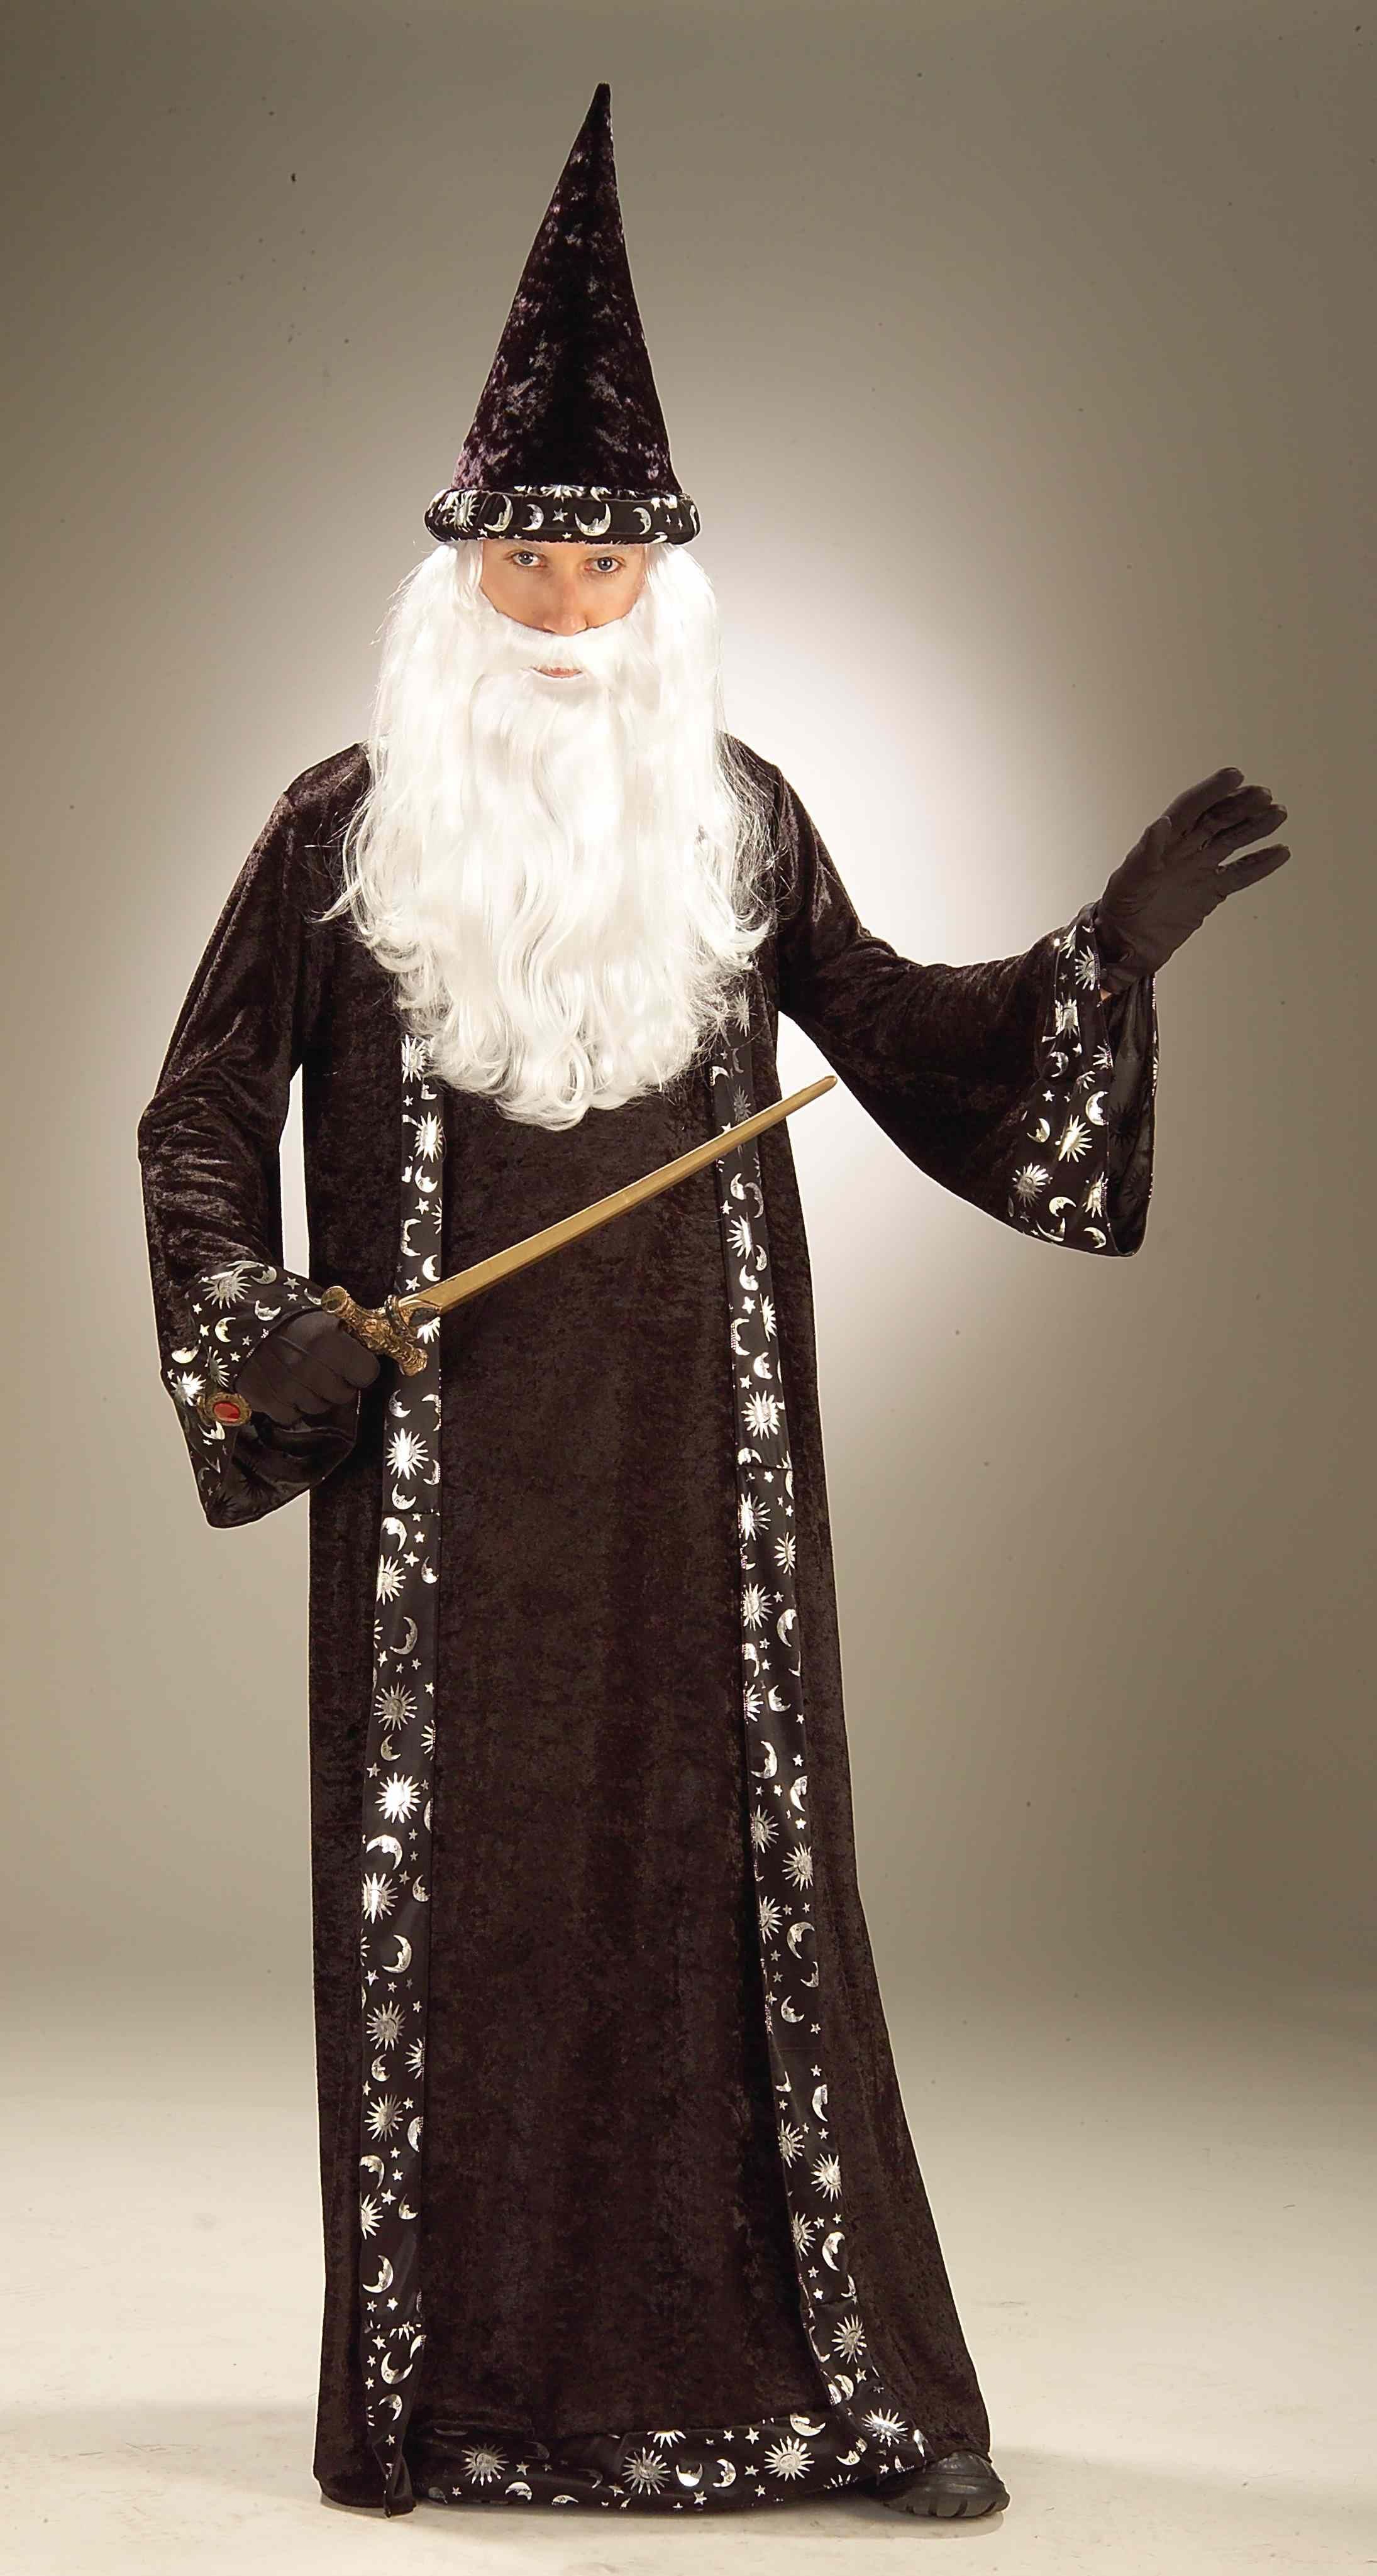 Костюм волшебника своими руками фото